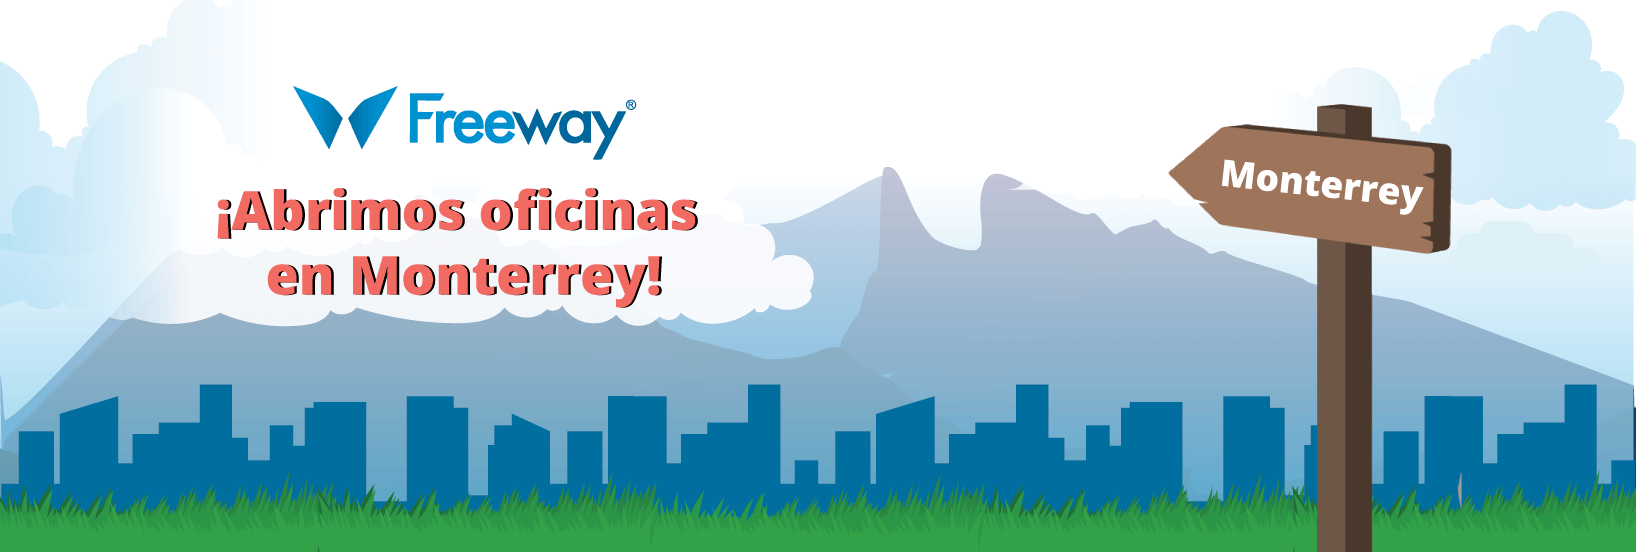 Freeway Consulting abre oficinas en Monterrey, México